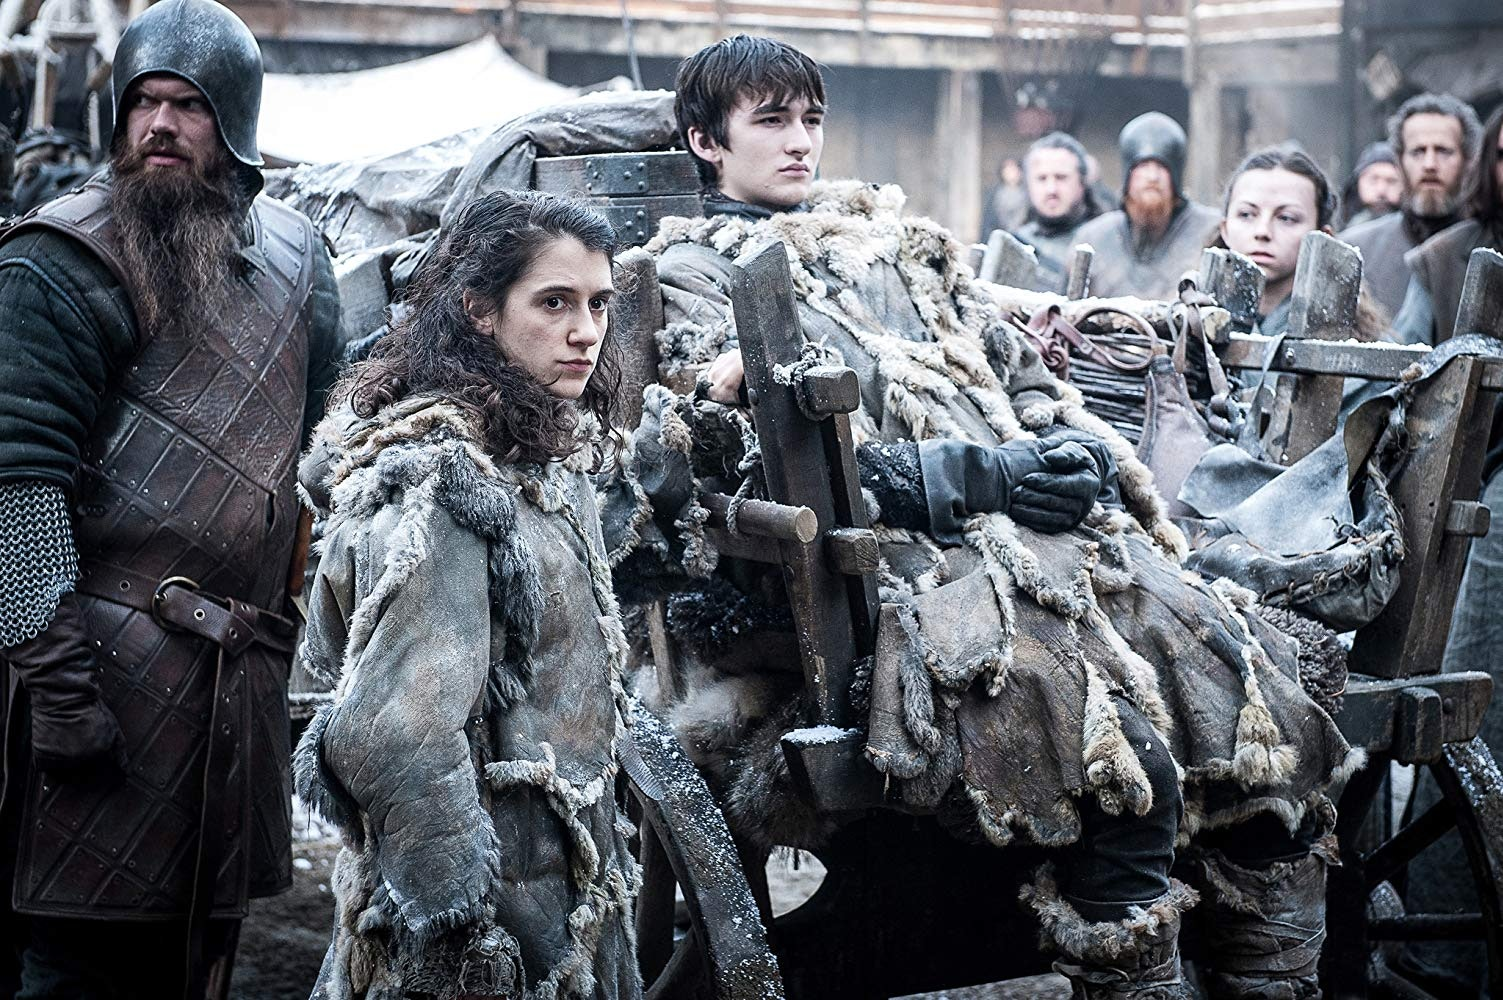 Ellie Kendrick and Isaac Hempstead Wright as Bran Stark on 'Game of Thrones'